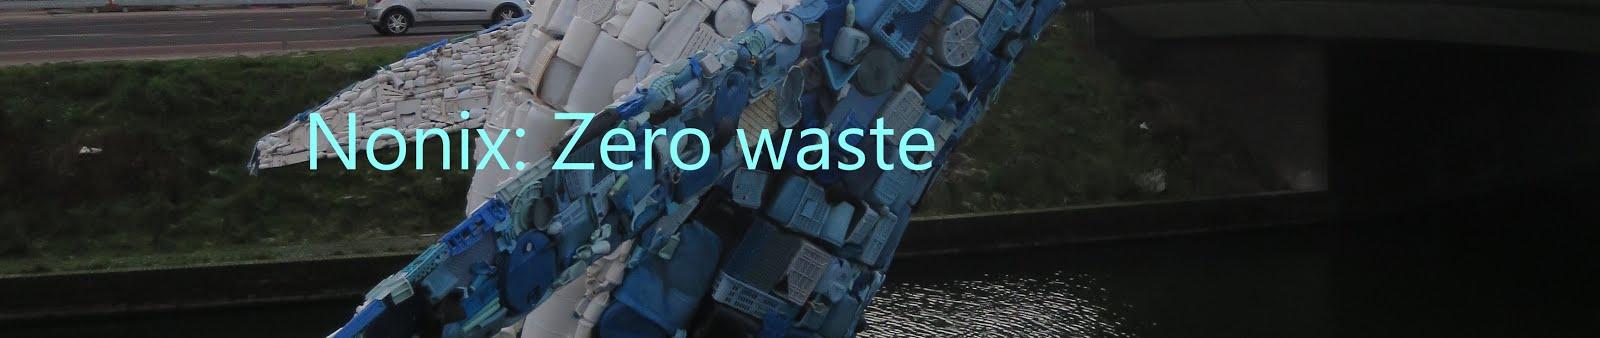 Nonix: zero waste blog